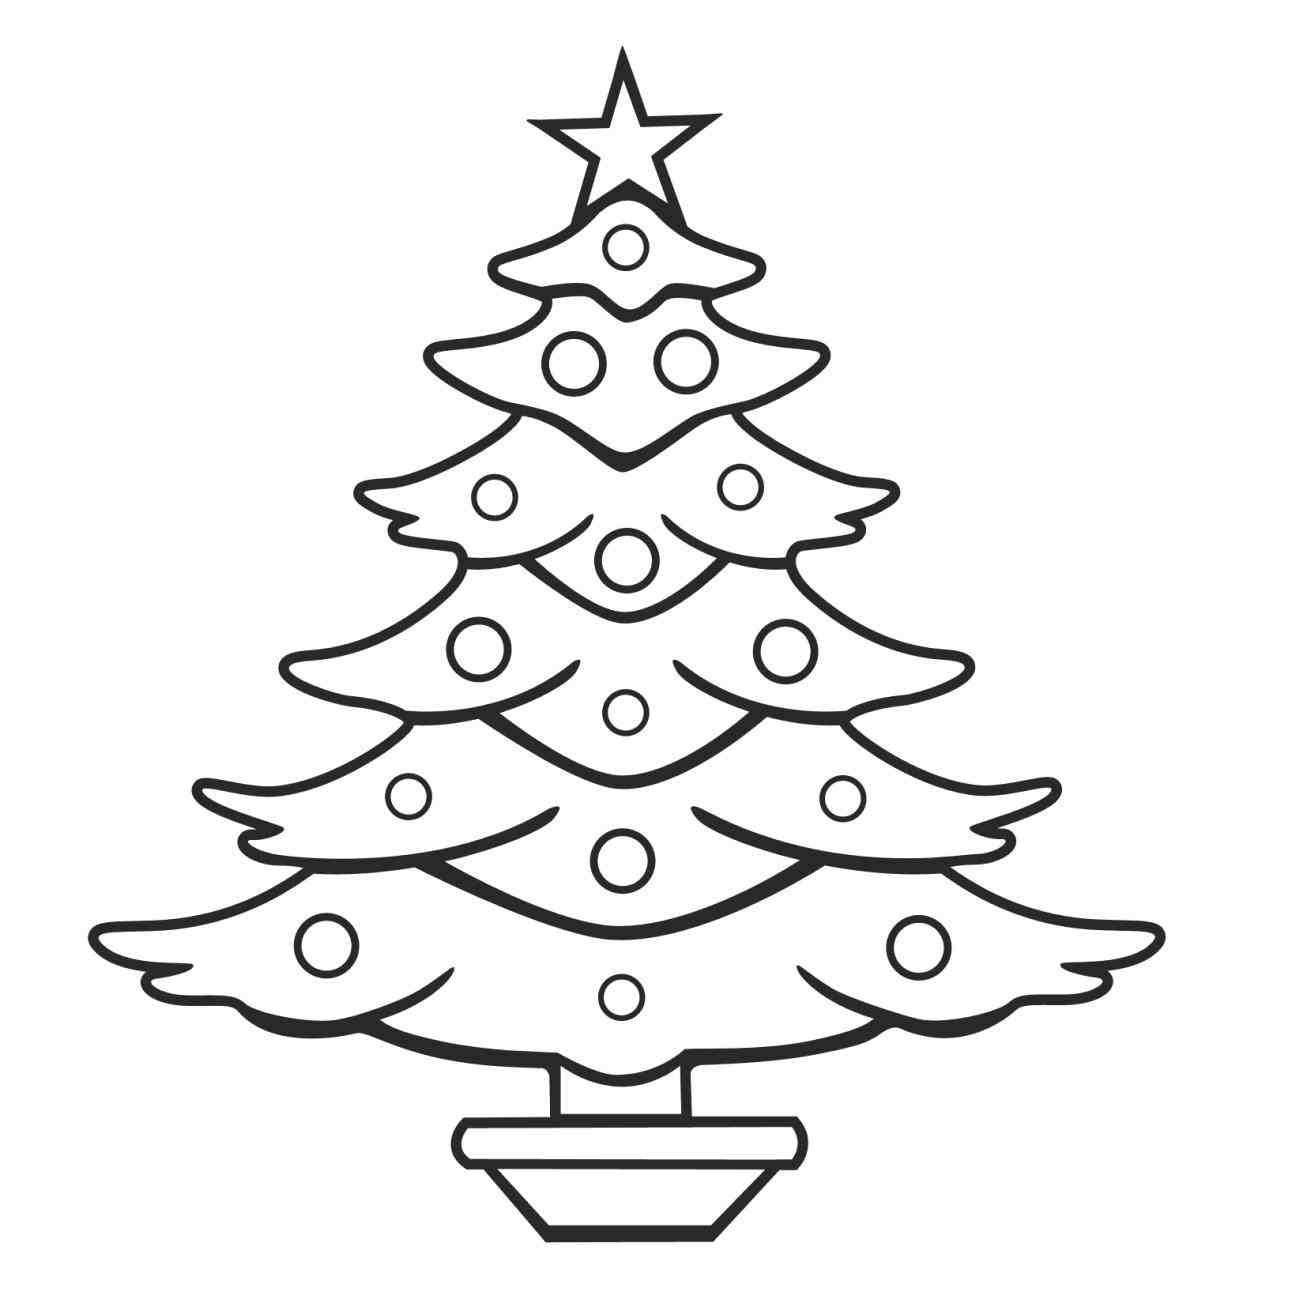 Drawing Christmas Tree Sketch.Christmas Tree Sketches Xmast Decors Christmas Tree